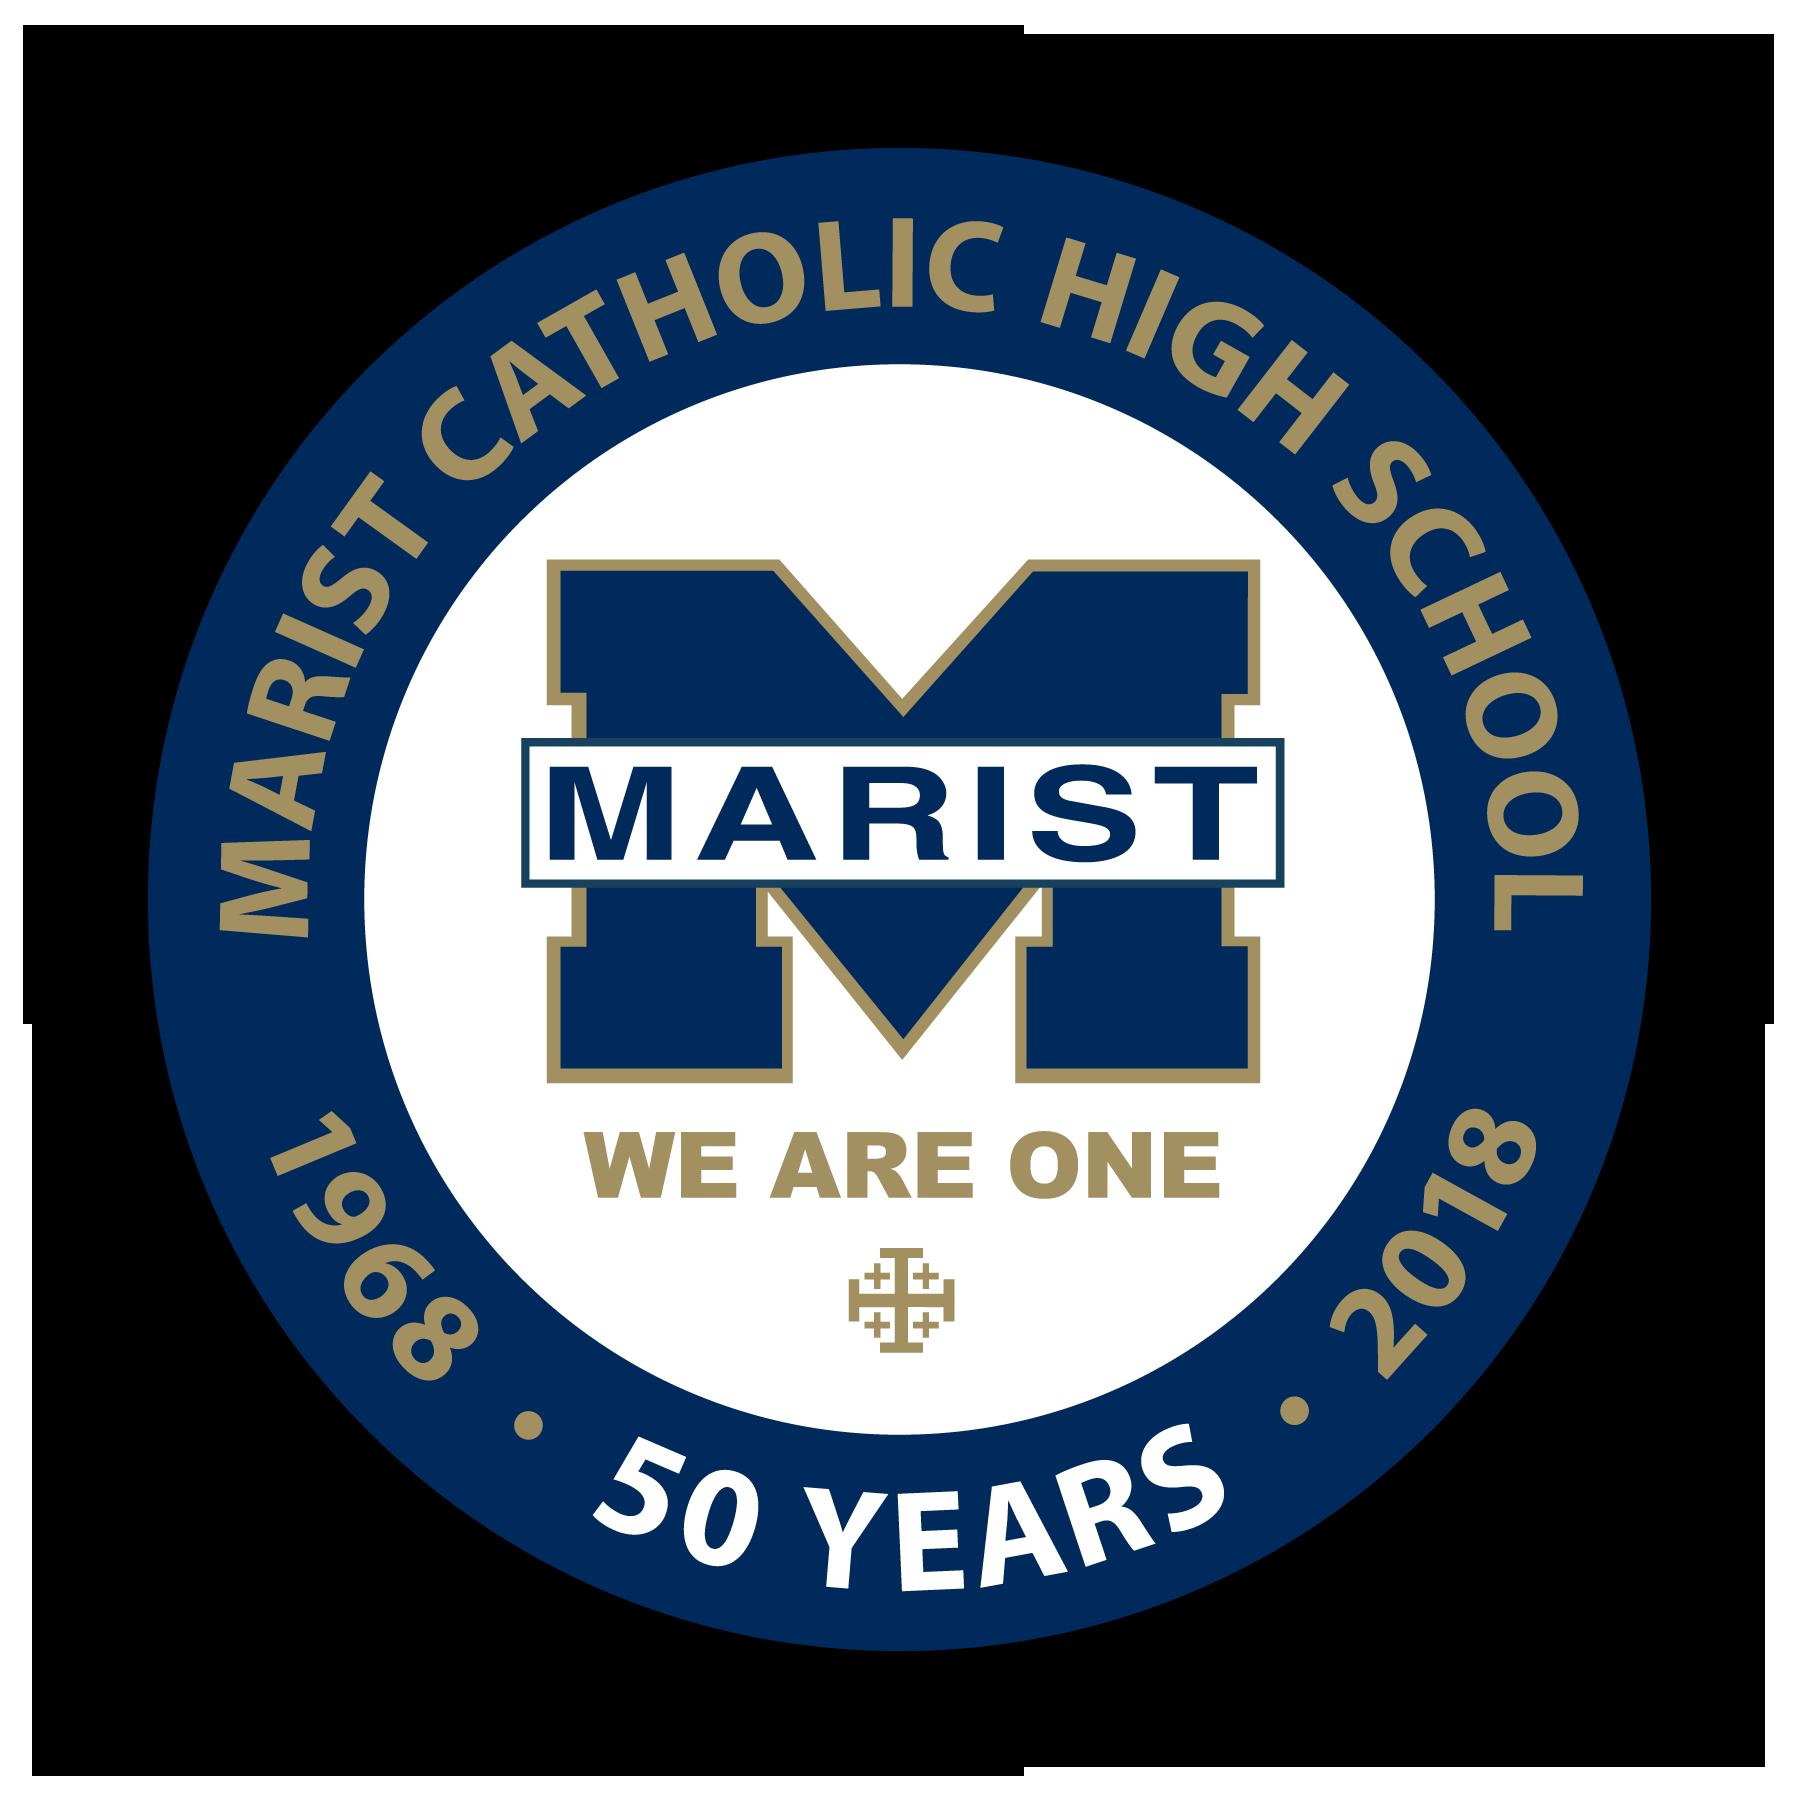 Marist Catholic High School.png